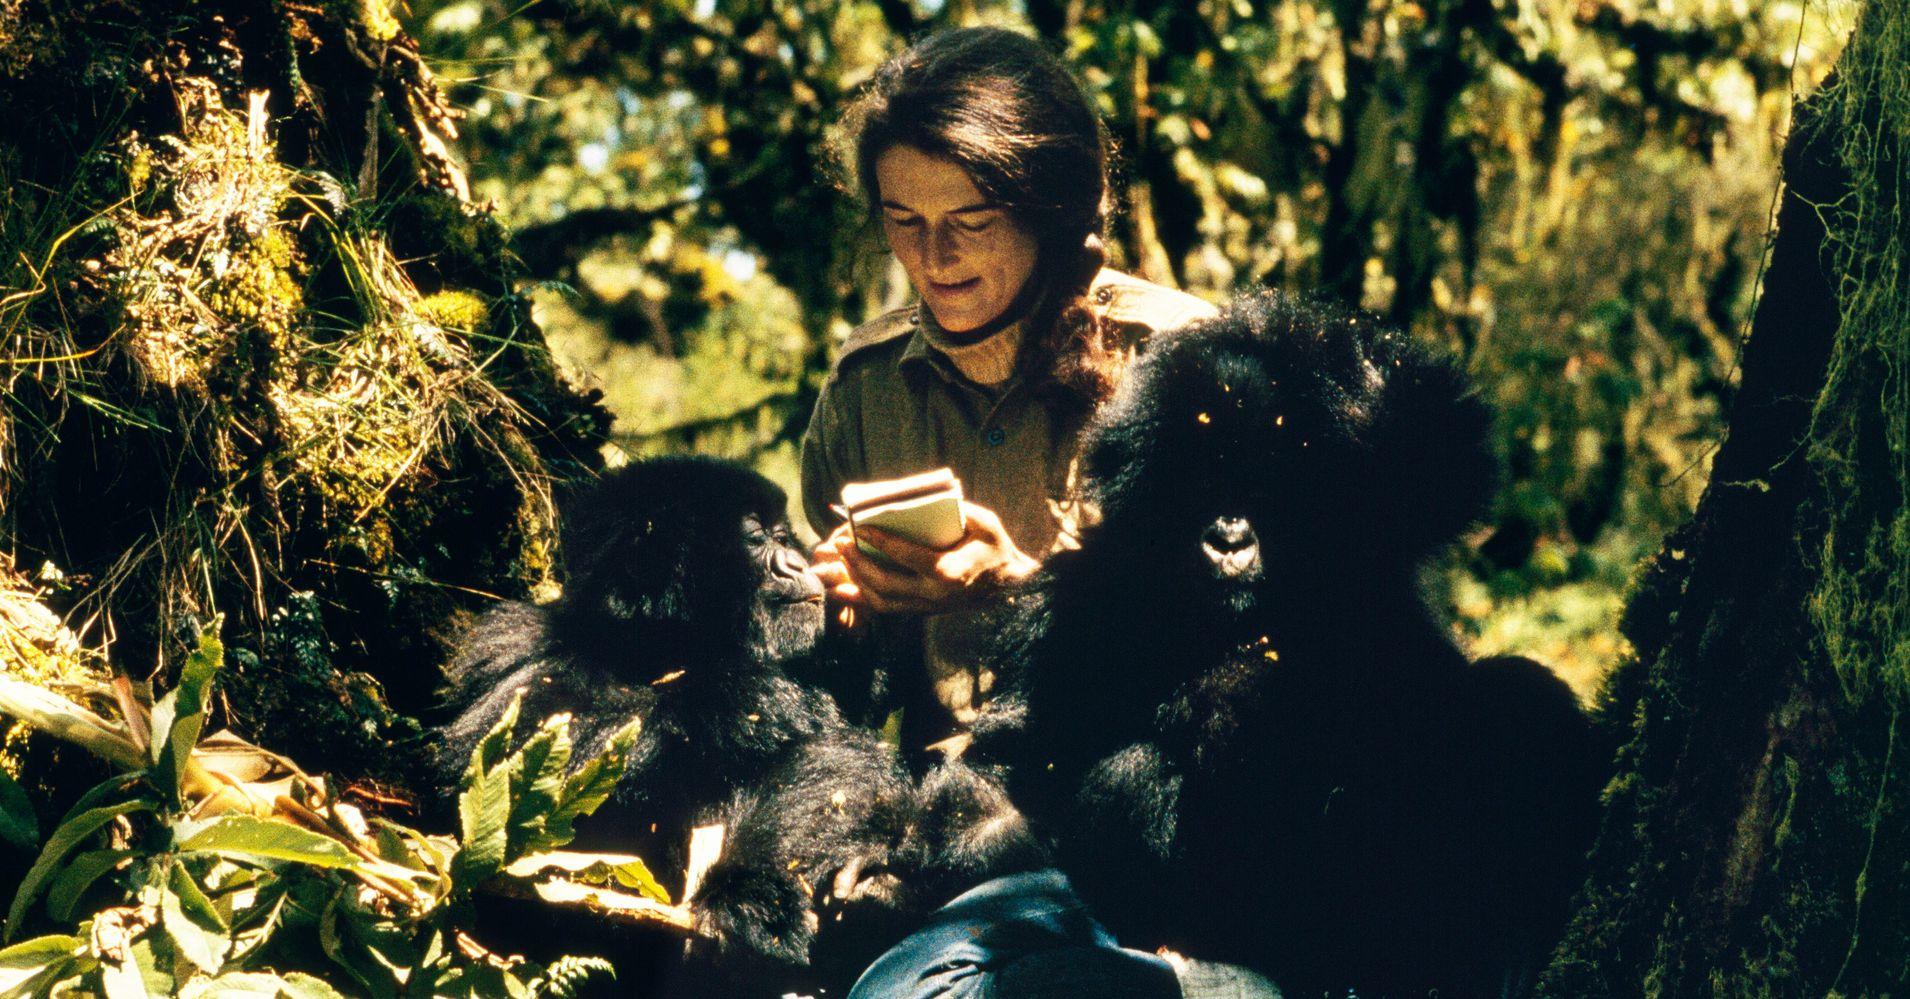 Slain 'Gorilla's In The Mist' Primatologist Dian Fossey Featured In New Series